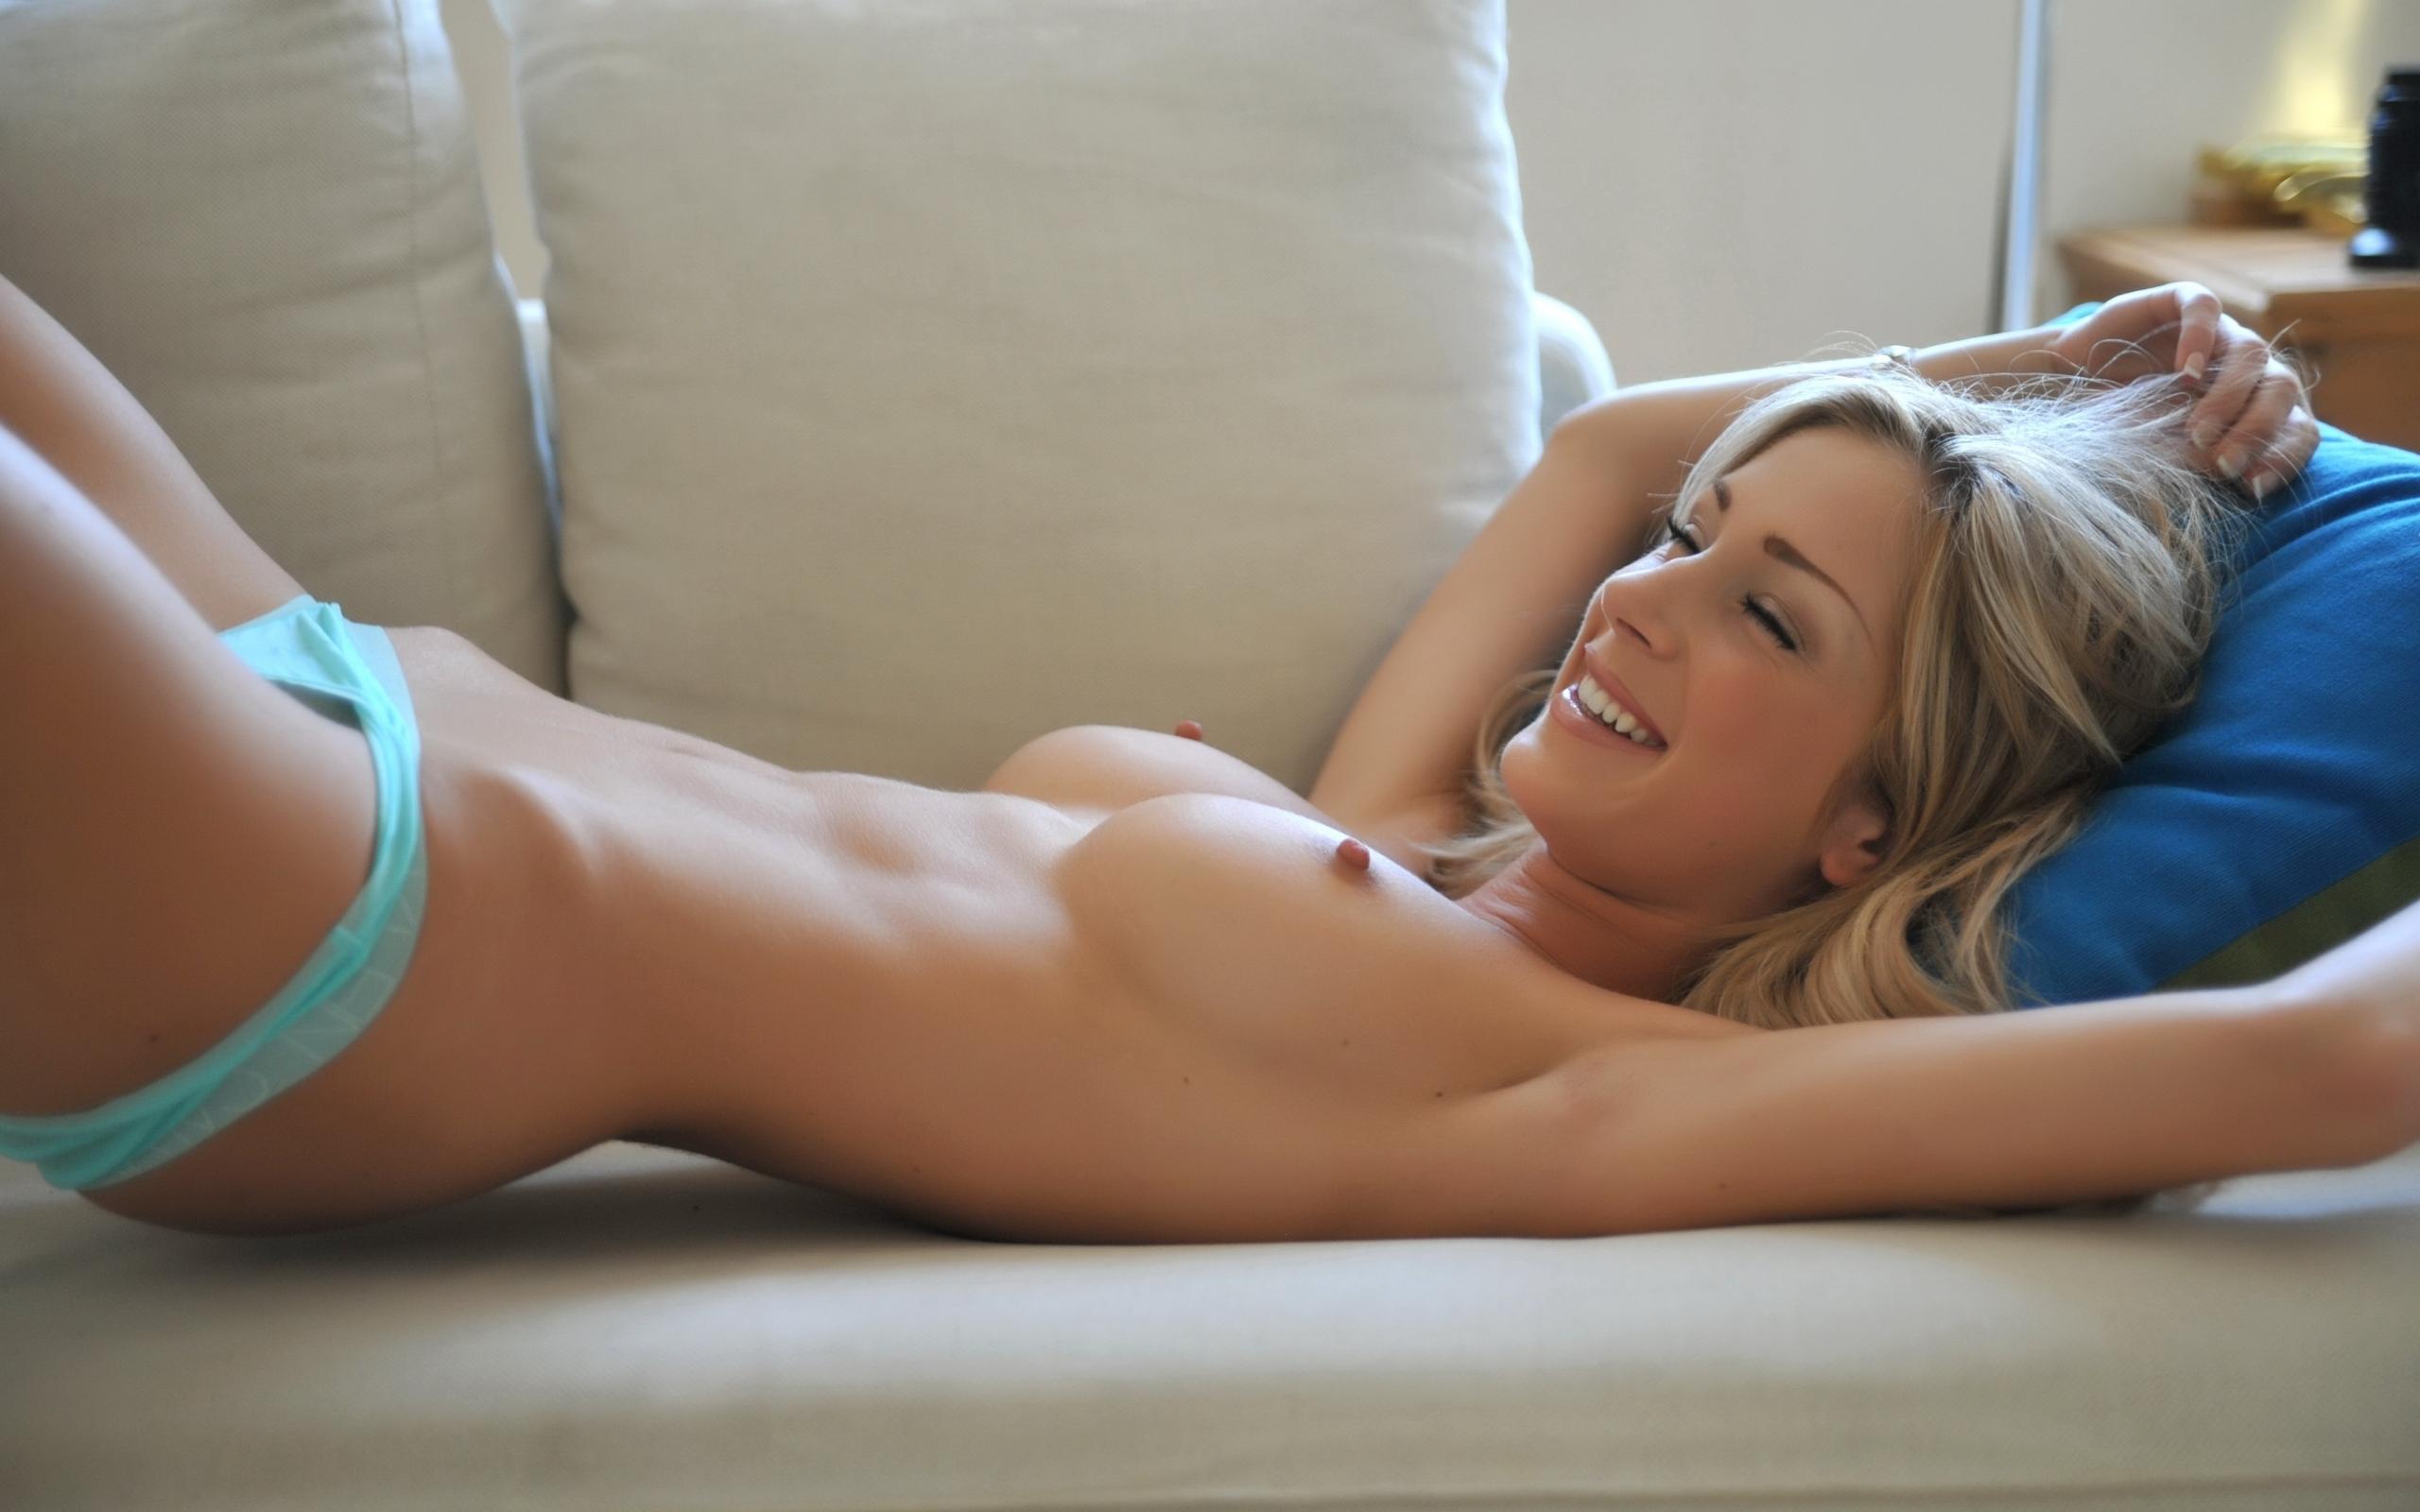 Teen body erotic petite